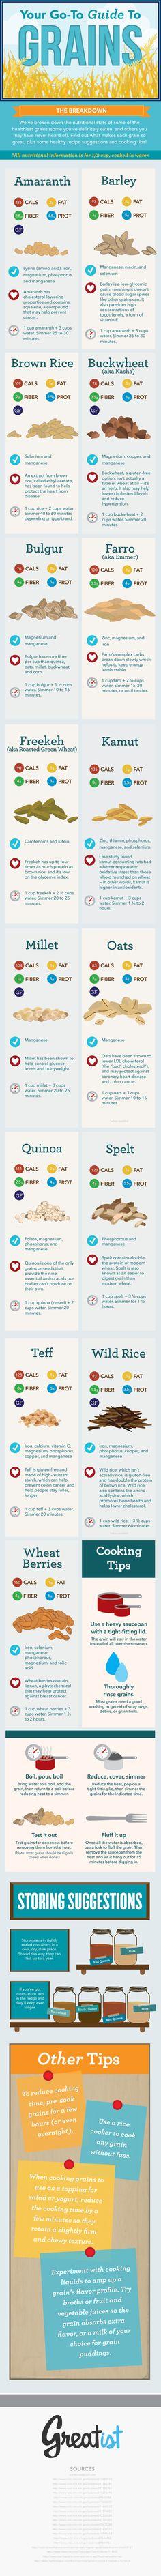 Choosing Healthier Grains